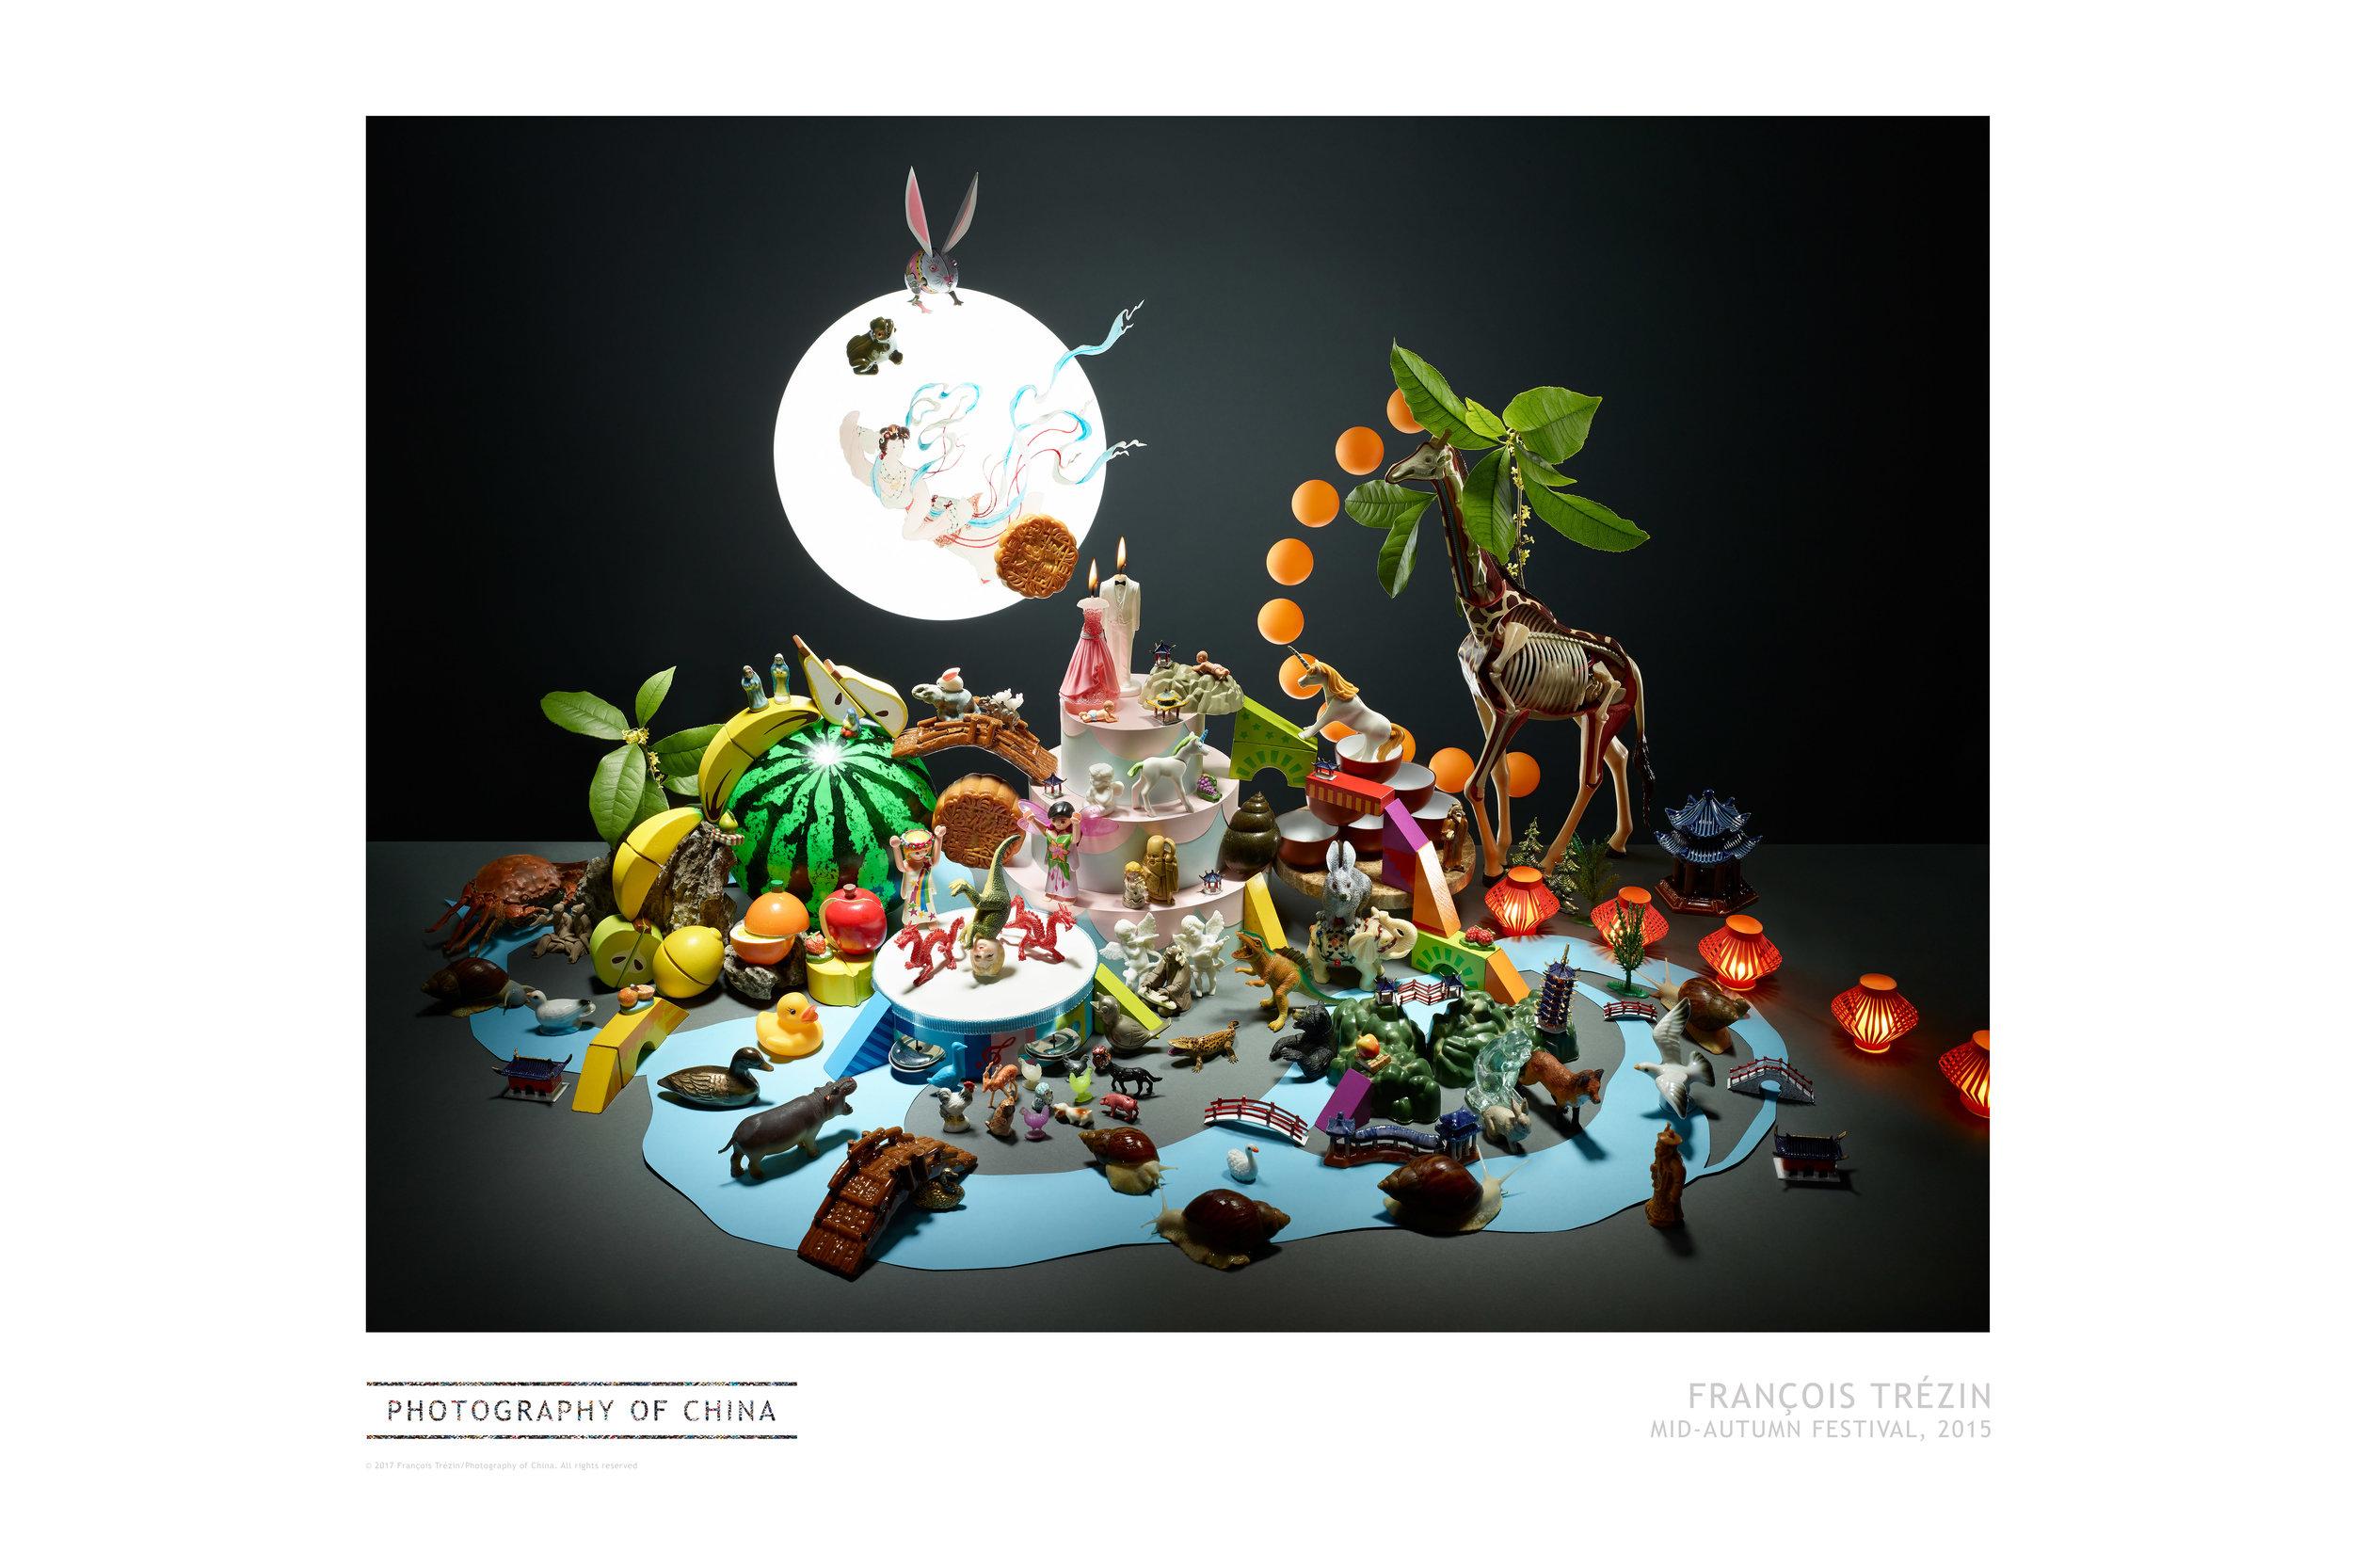 web-francois-trezin-poster-2017-photography-of-china-3.jpg